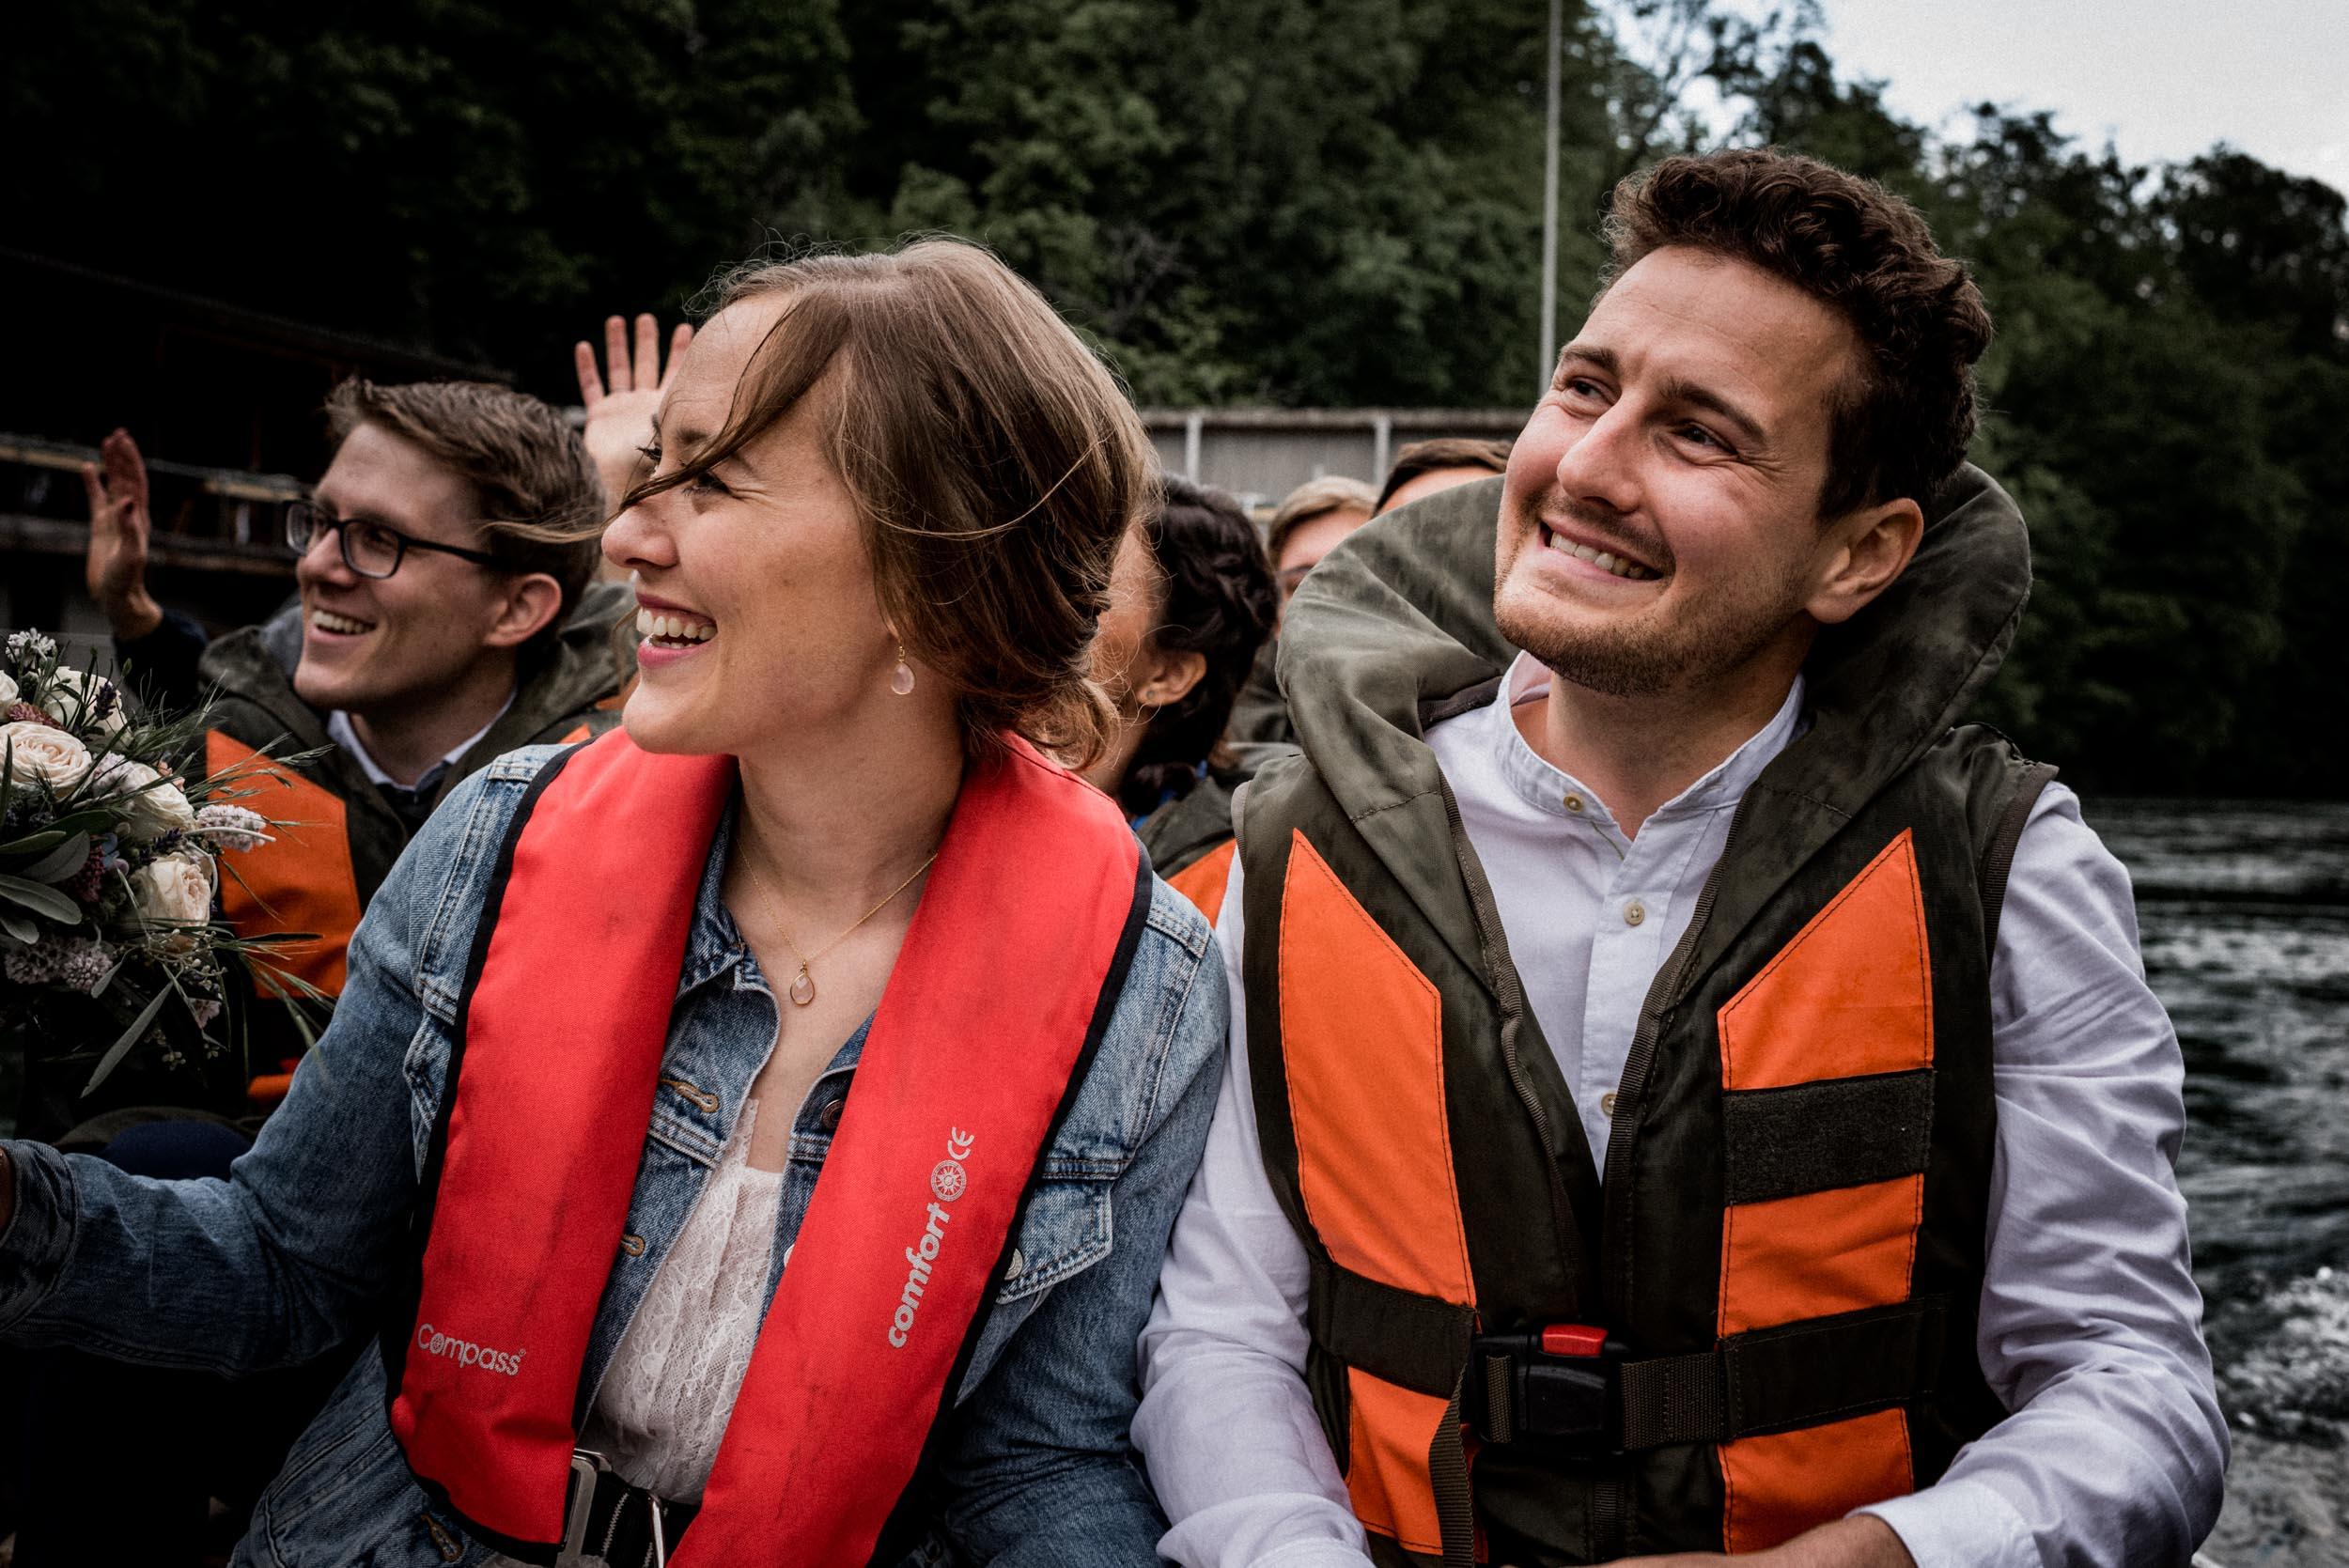 Hochzeitsreportage-Baden-Aargau_2019_29.jpg